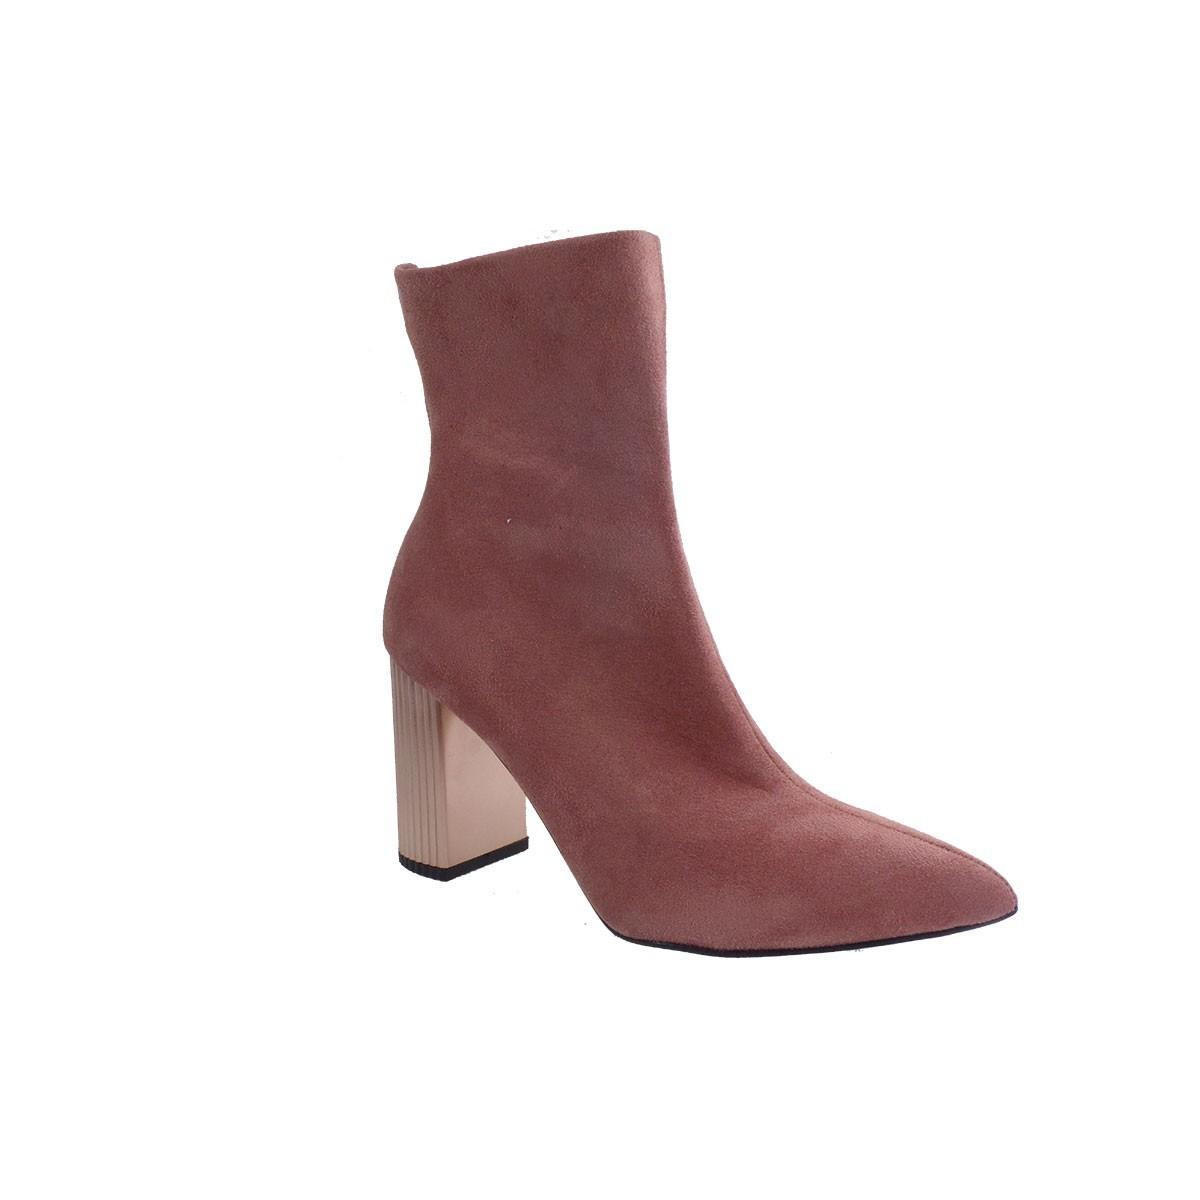 Alessandra Paggioti Γυναικεία Παπούτσια Μποτάκια 81544 Old Pink Καστόρι